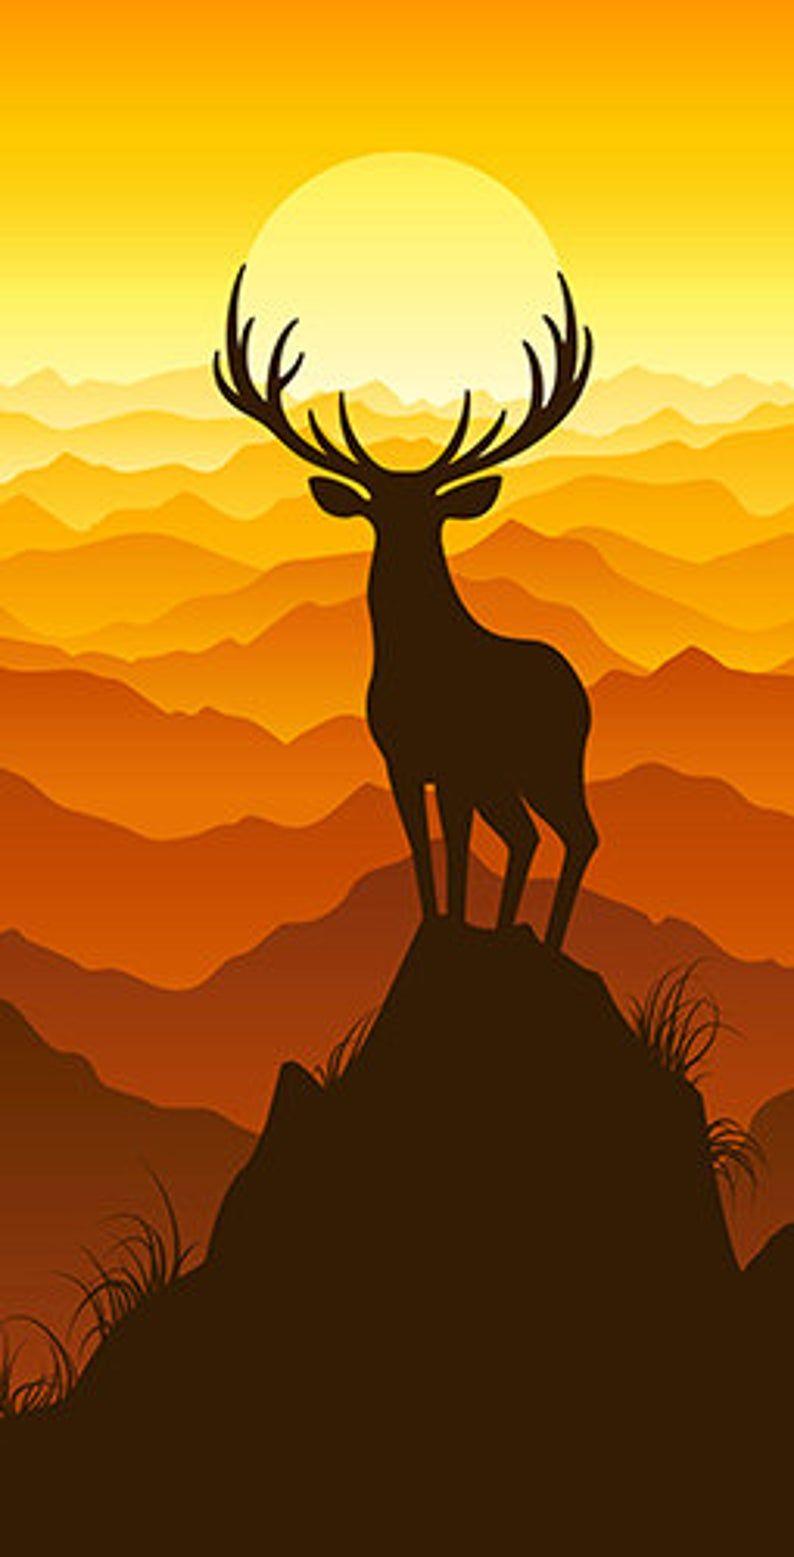 Deer Buck on top of Mountain with sunset Cornhole Board Prints / Wraps   Corn Hole Wraps   Bag Toss   Corn Toss   Custom